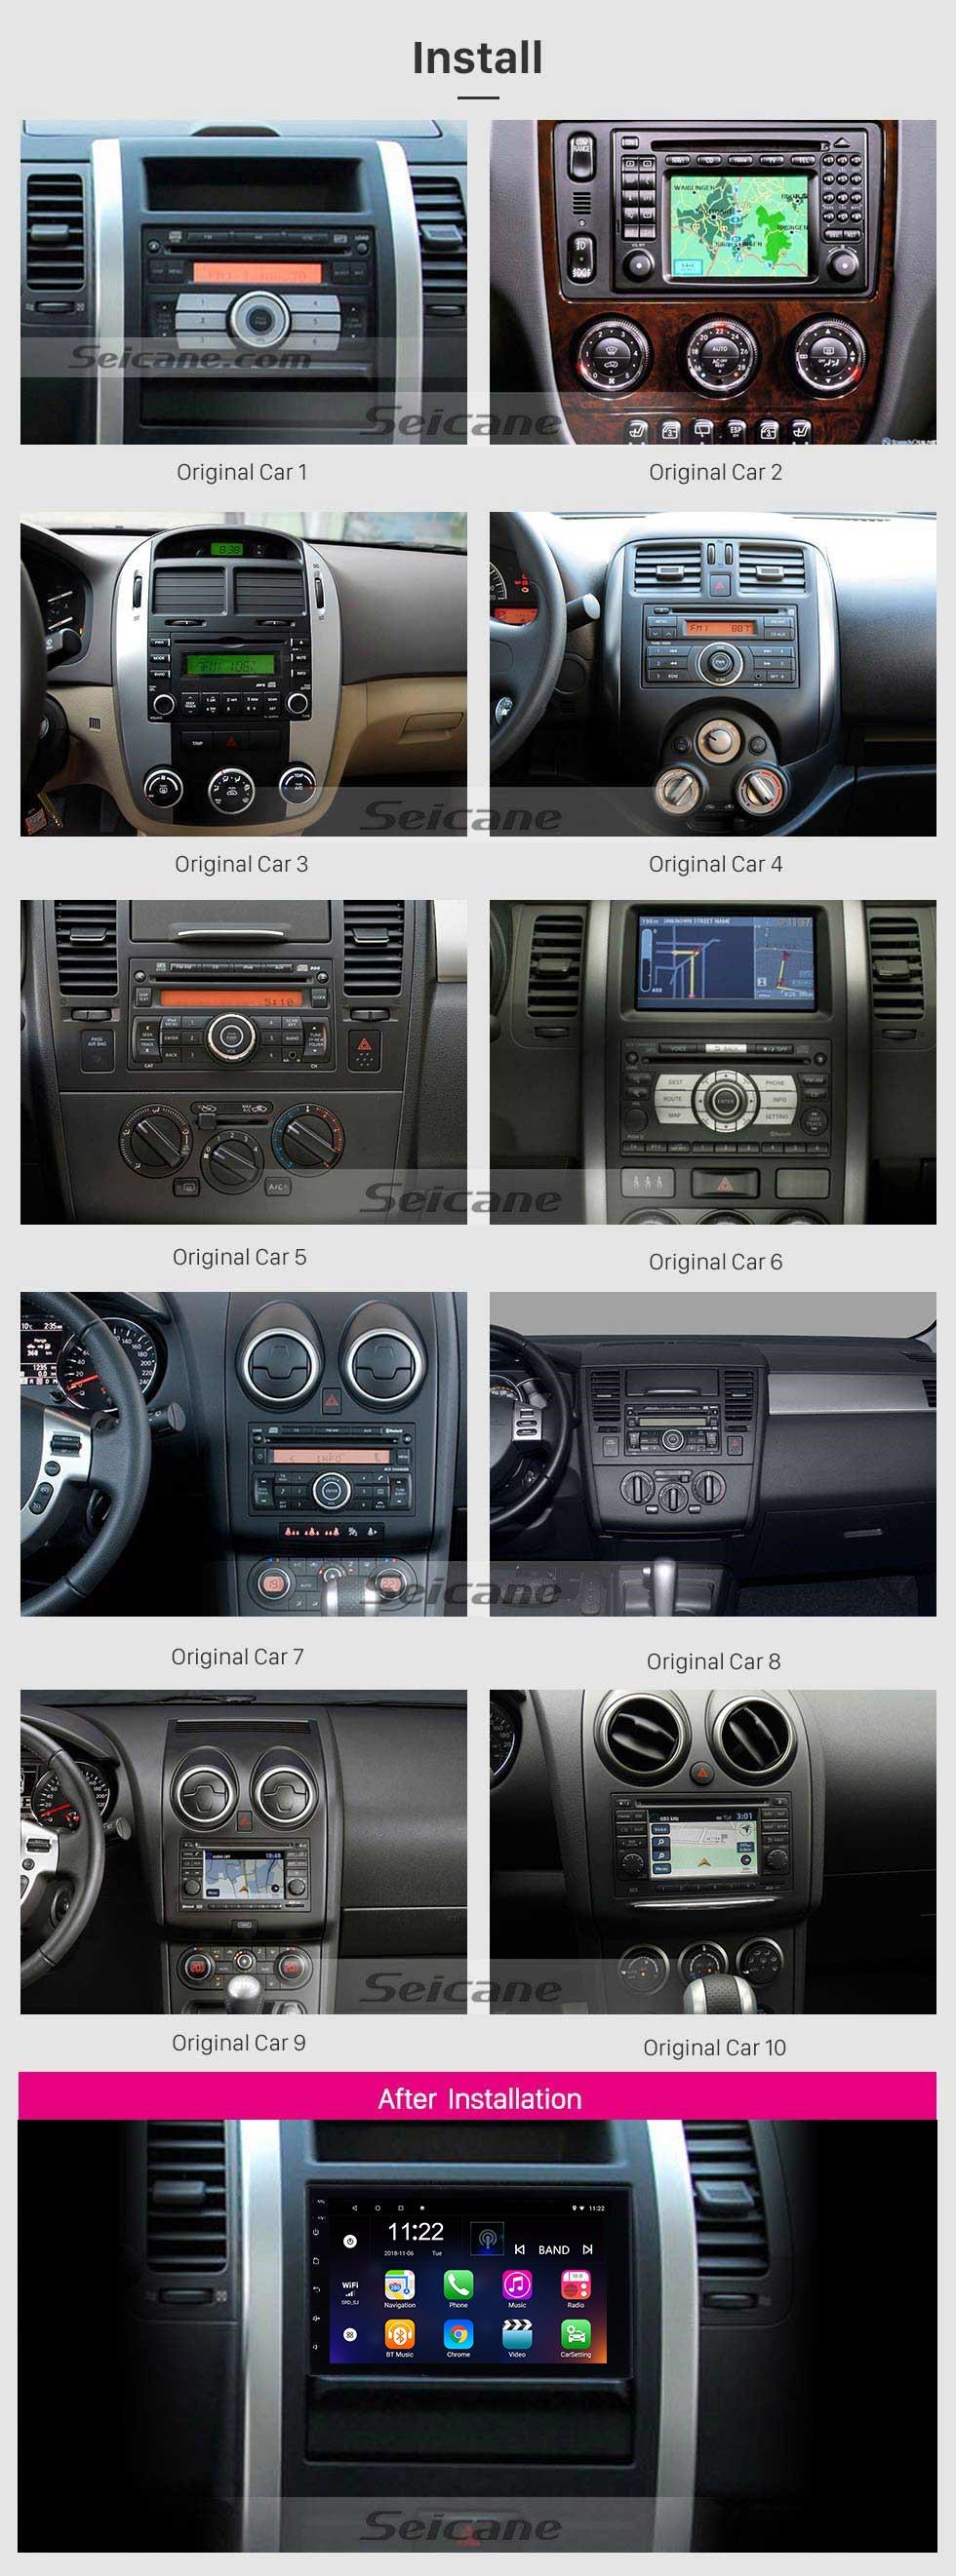 Seicane Android 8.1 Universal Toyota Hyundai Kia Nissan Volkswagen Suzuki Honda Radio GPS Navigation 1080P Video Bluetooth USB WIFI Unterstützung Rückfahrkamera Spiegel Link Lenkradsteuerung